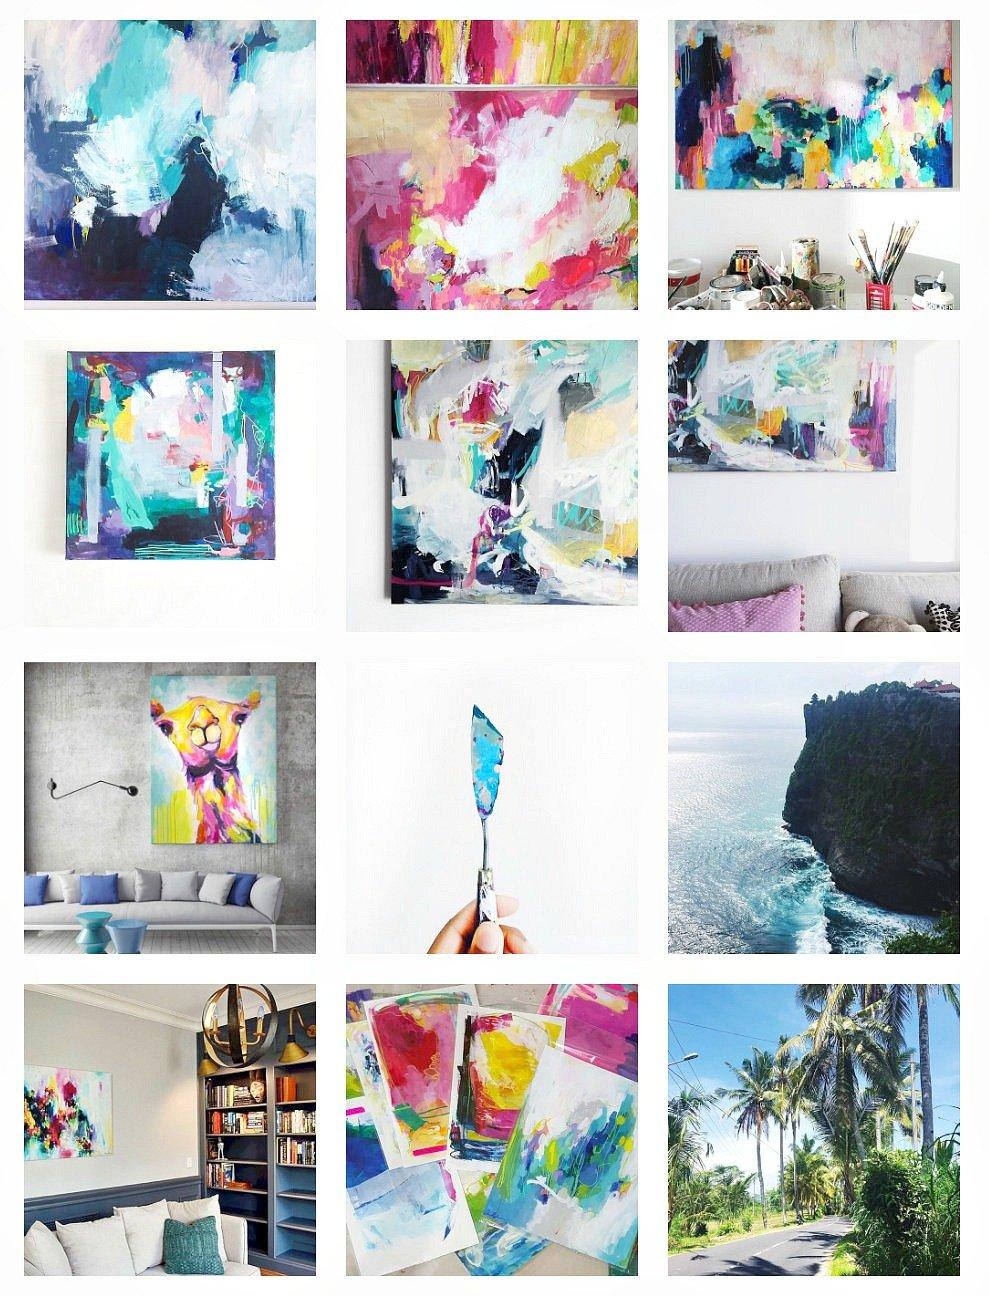 Artist Amira Rahim on Instagram. Artist Spotlight